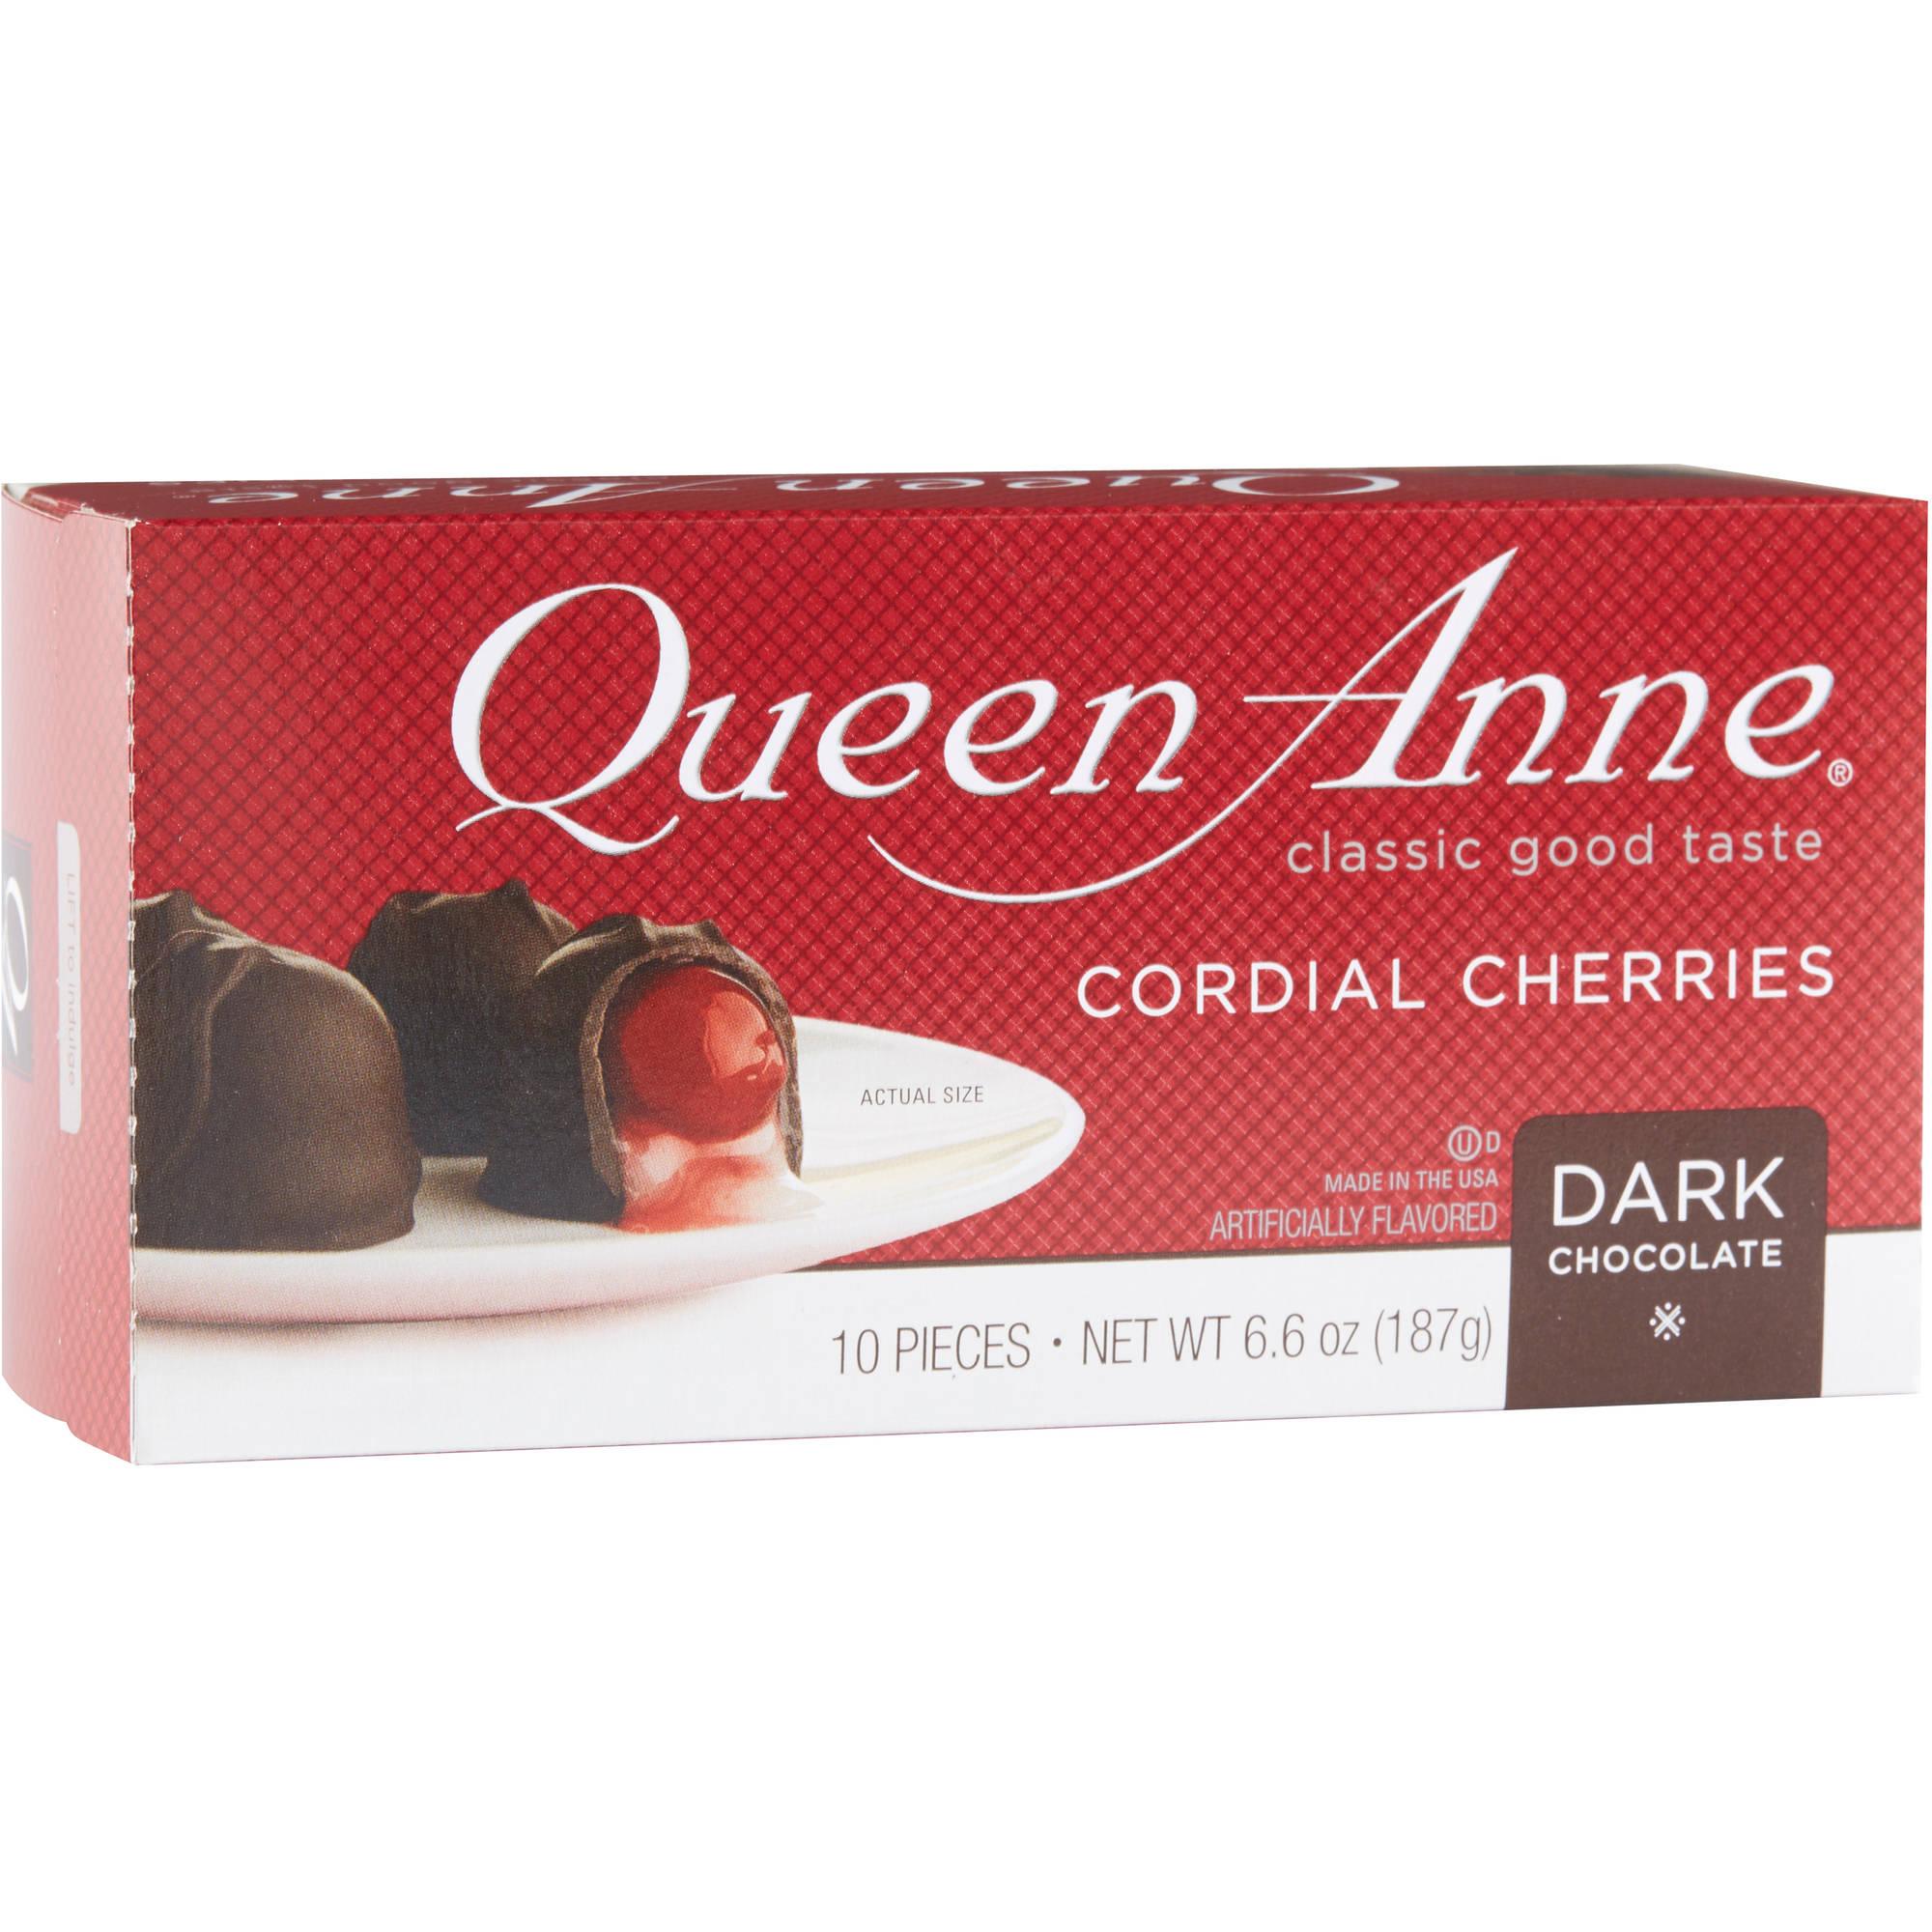 Queen Anne Cordial Cherries Dark Chocolate